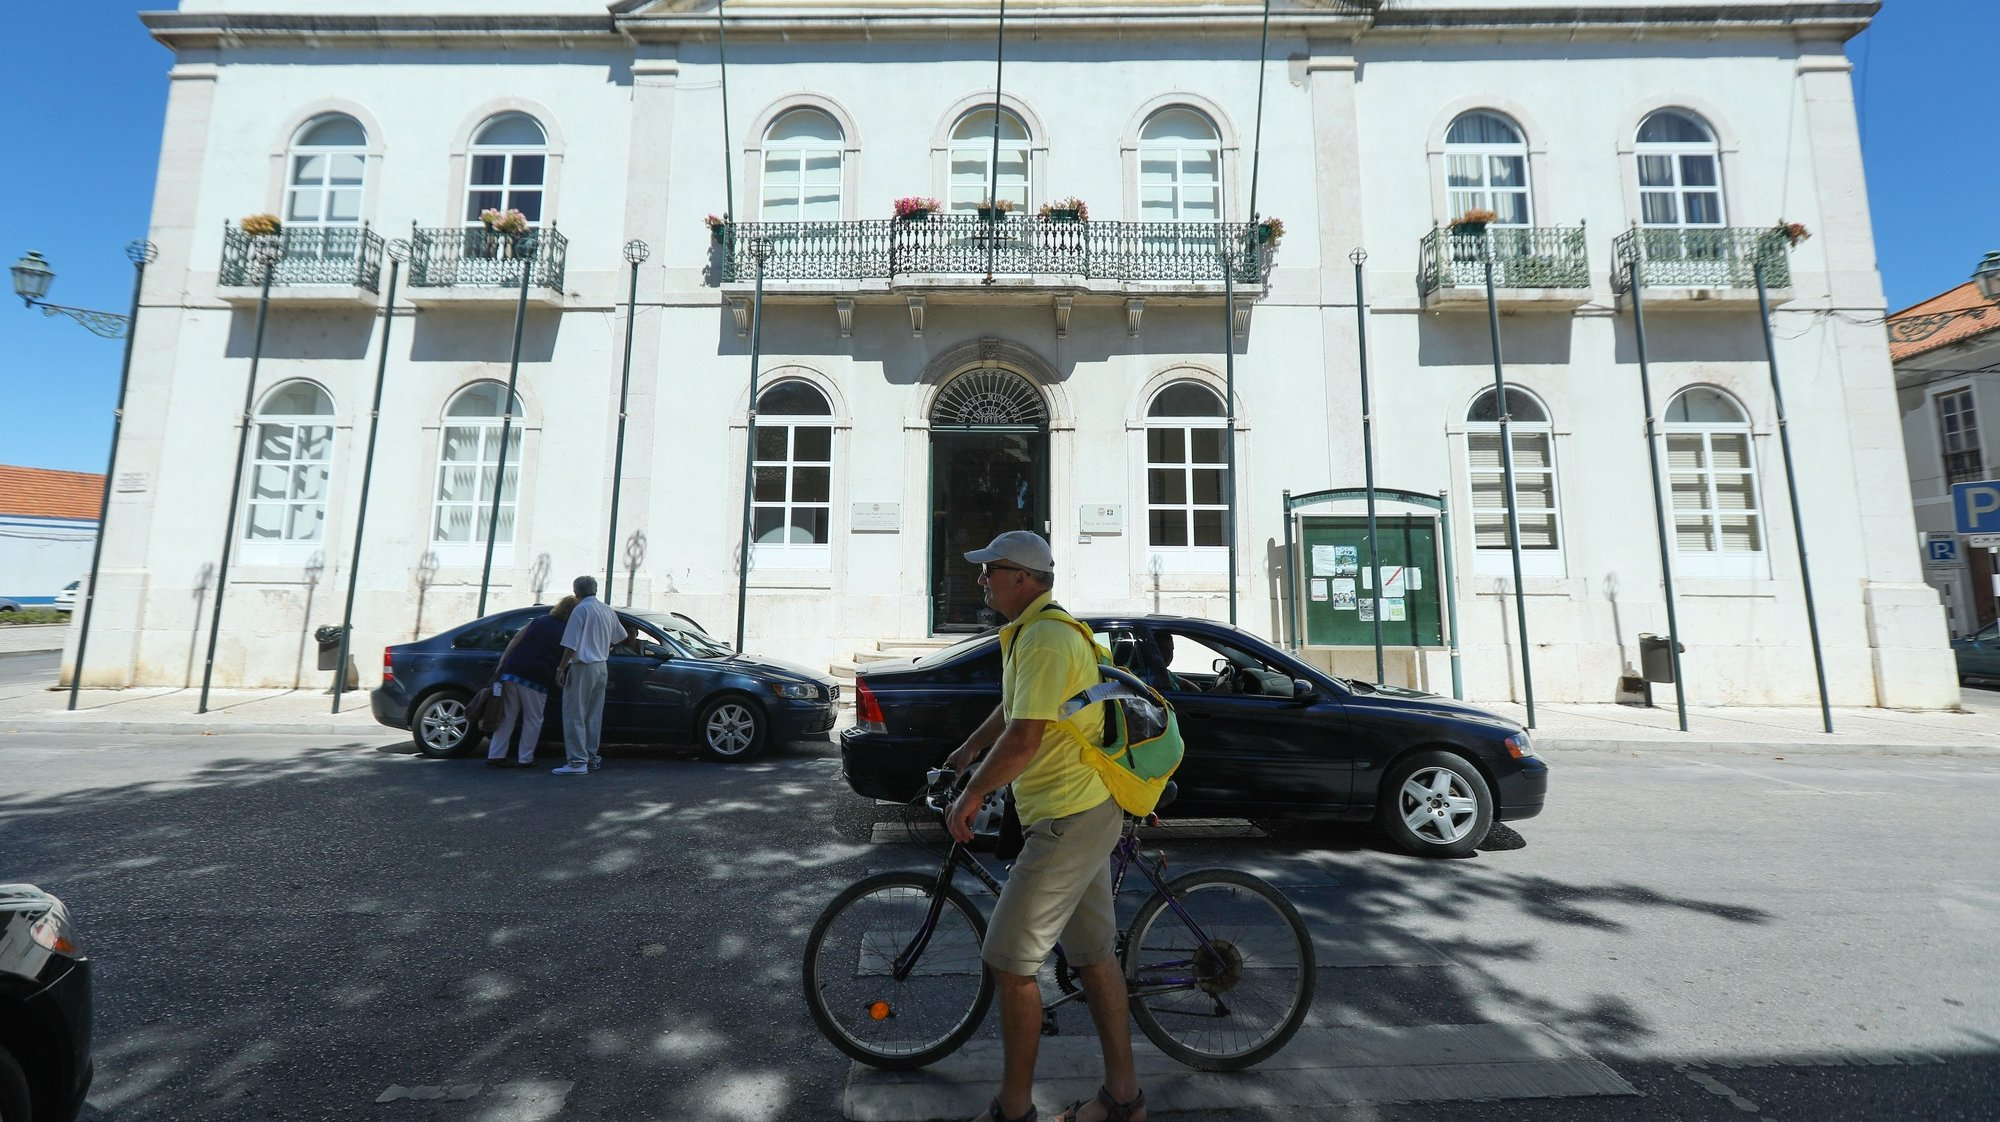 Edifício da Câmara Municipal do Montijo, 4 de agosto de 2017. MIGUEL A. LOPES/LUSA